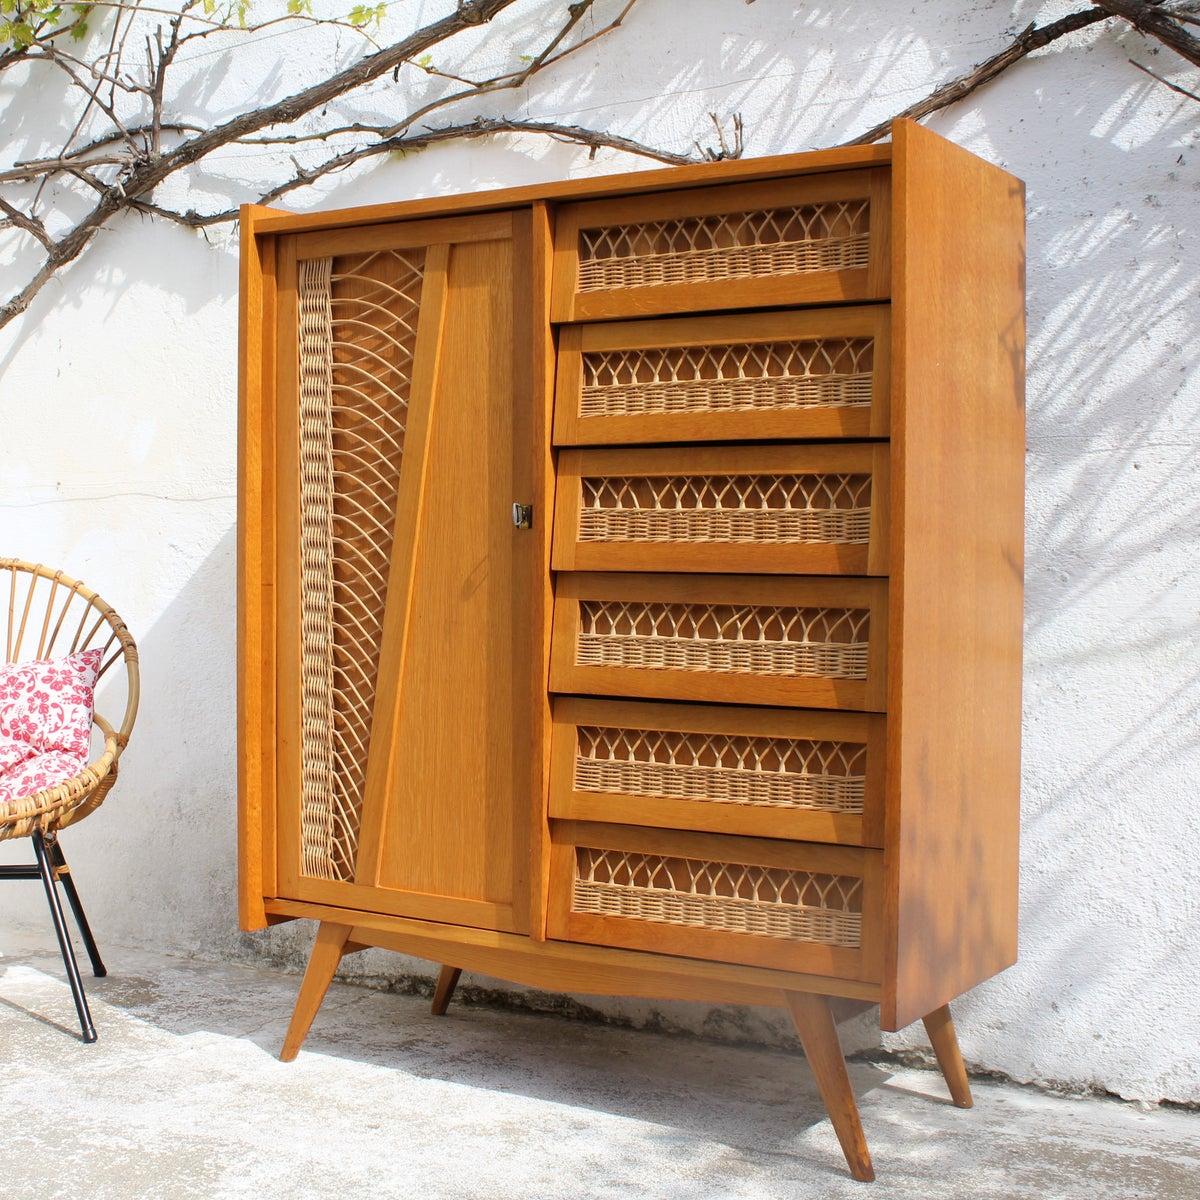 armoire commode en rotin 60 39 fibresendeco vannerie artisanale mobilier vintage. Black Bedroom Furniture Sets. Home Design Ideas